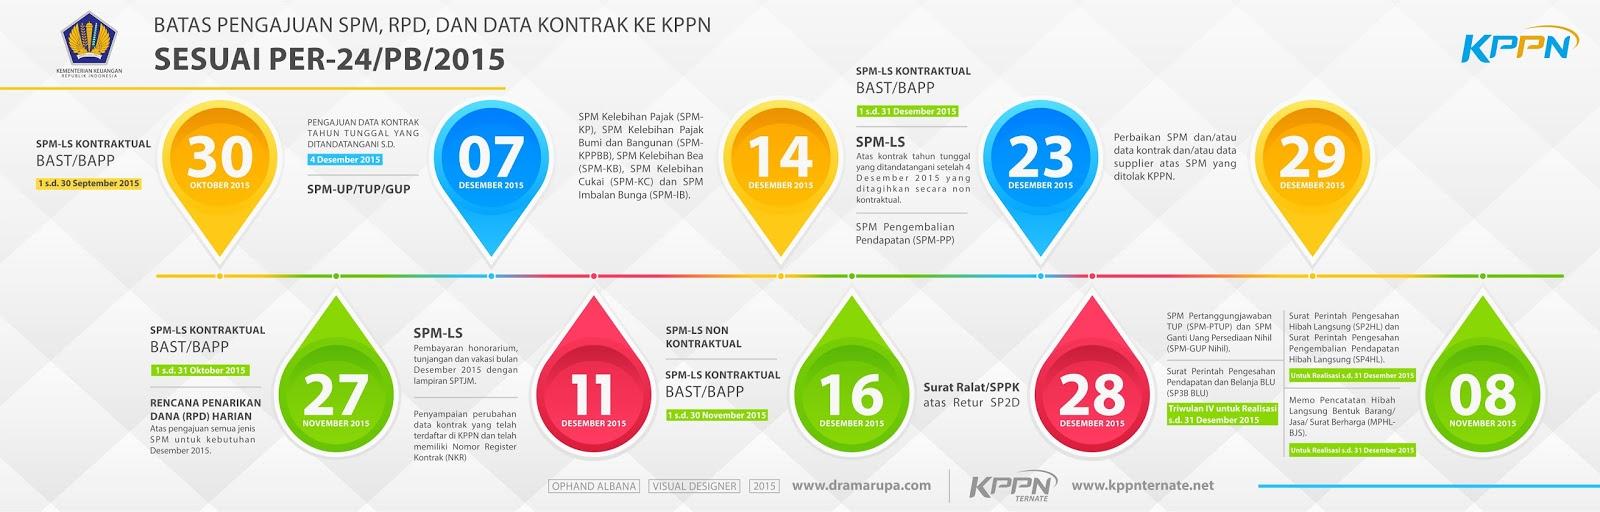 timeline batas akhir APBN 2015